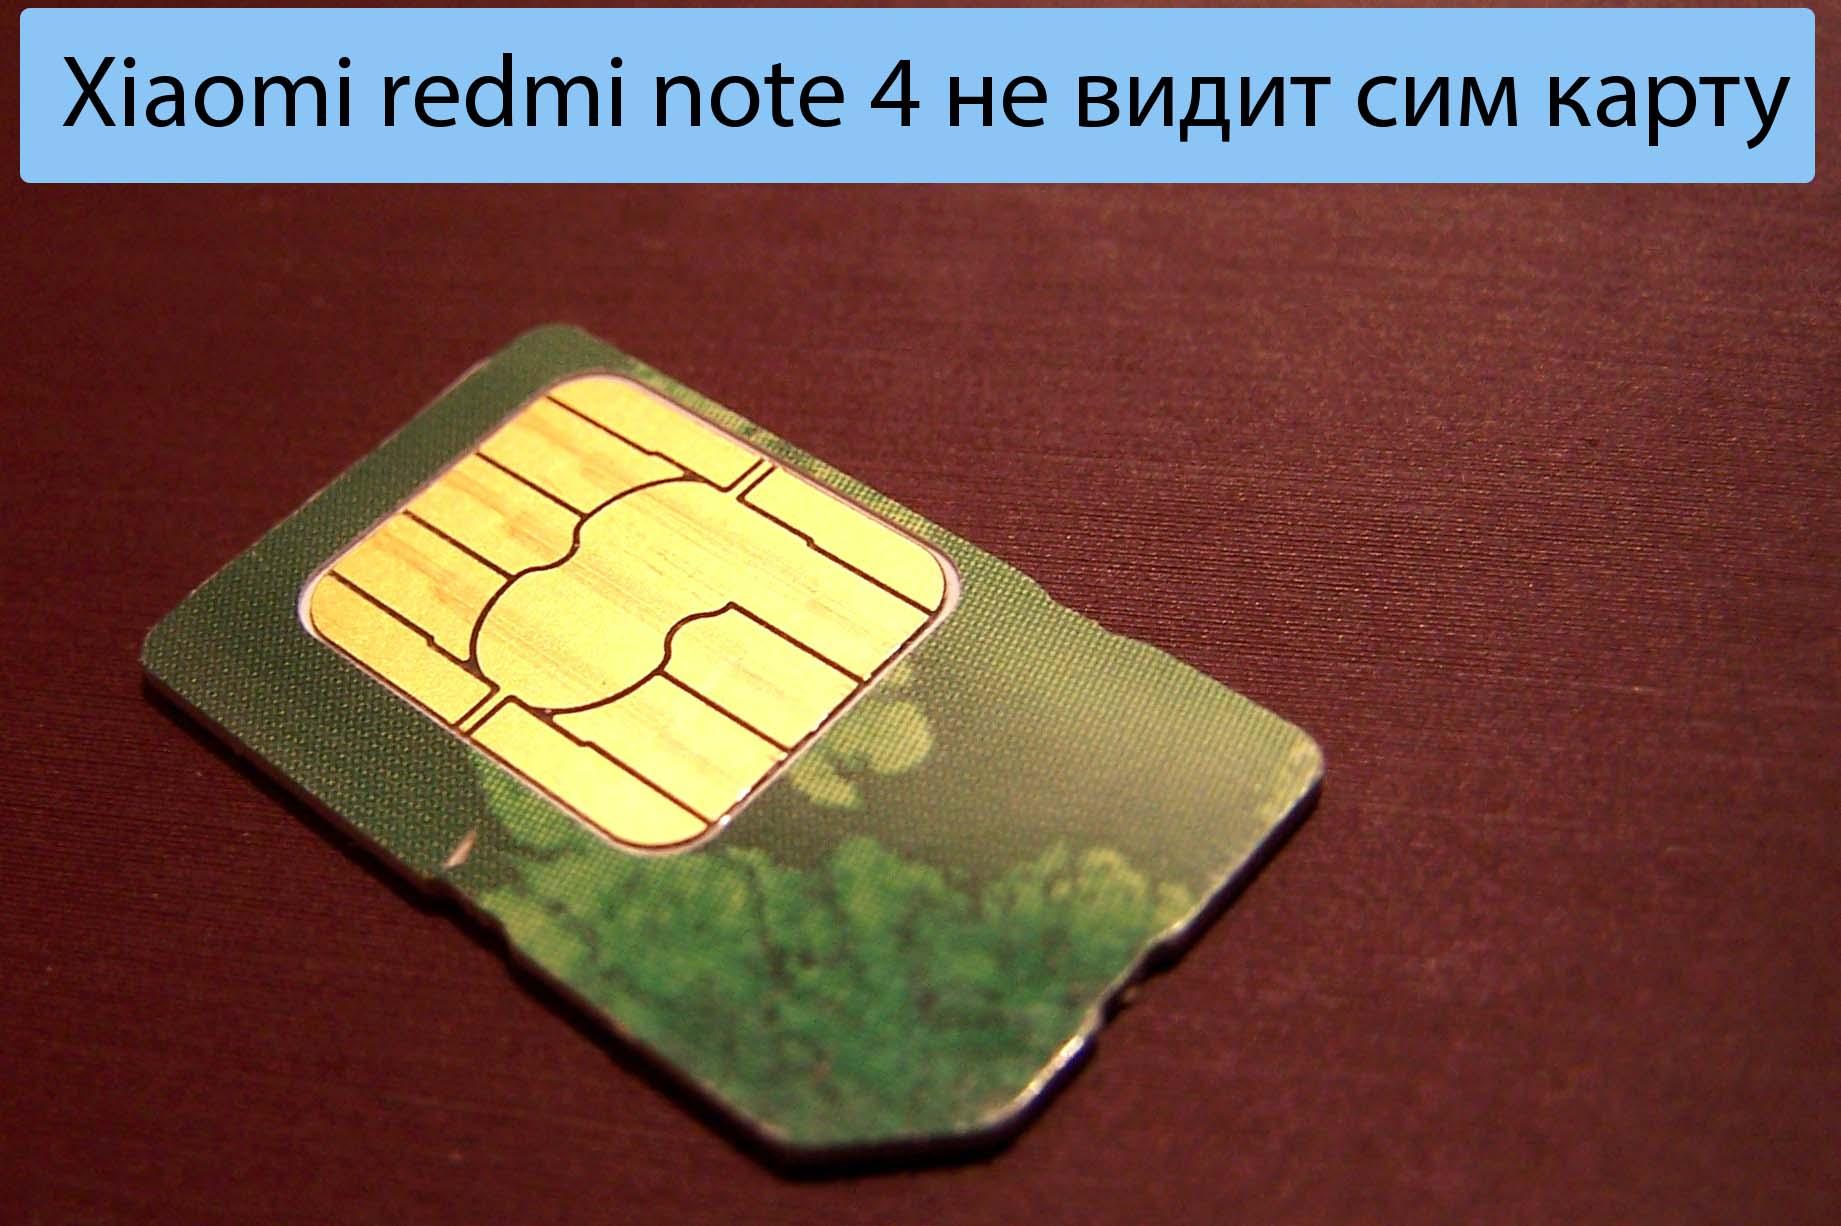 Xiaomi redmi note 4 не видит сим карту